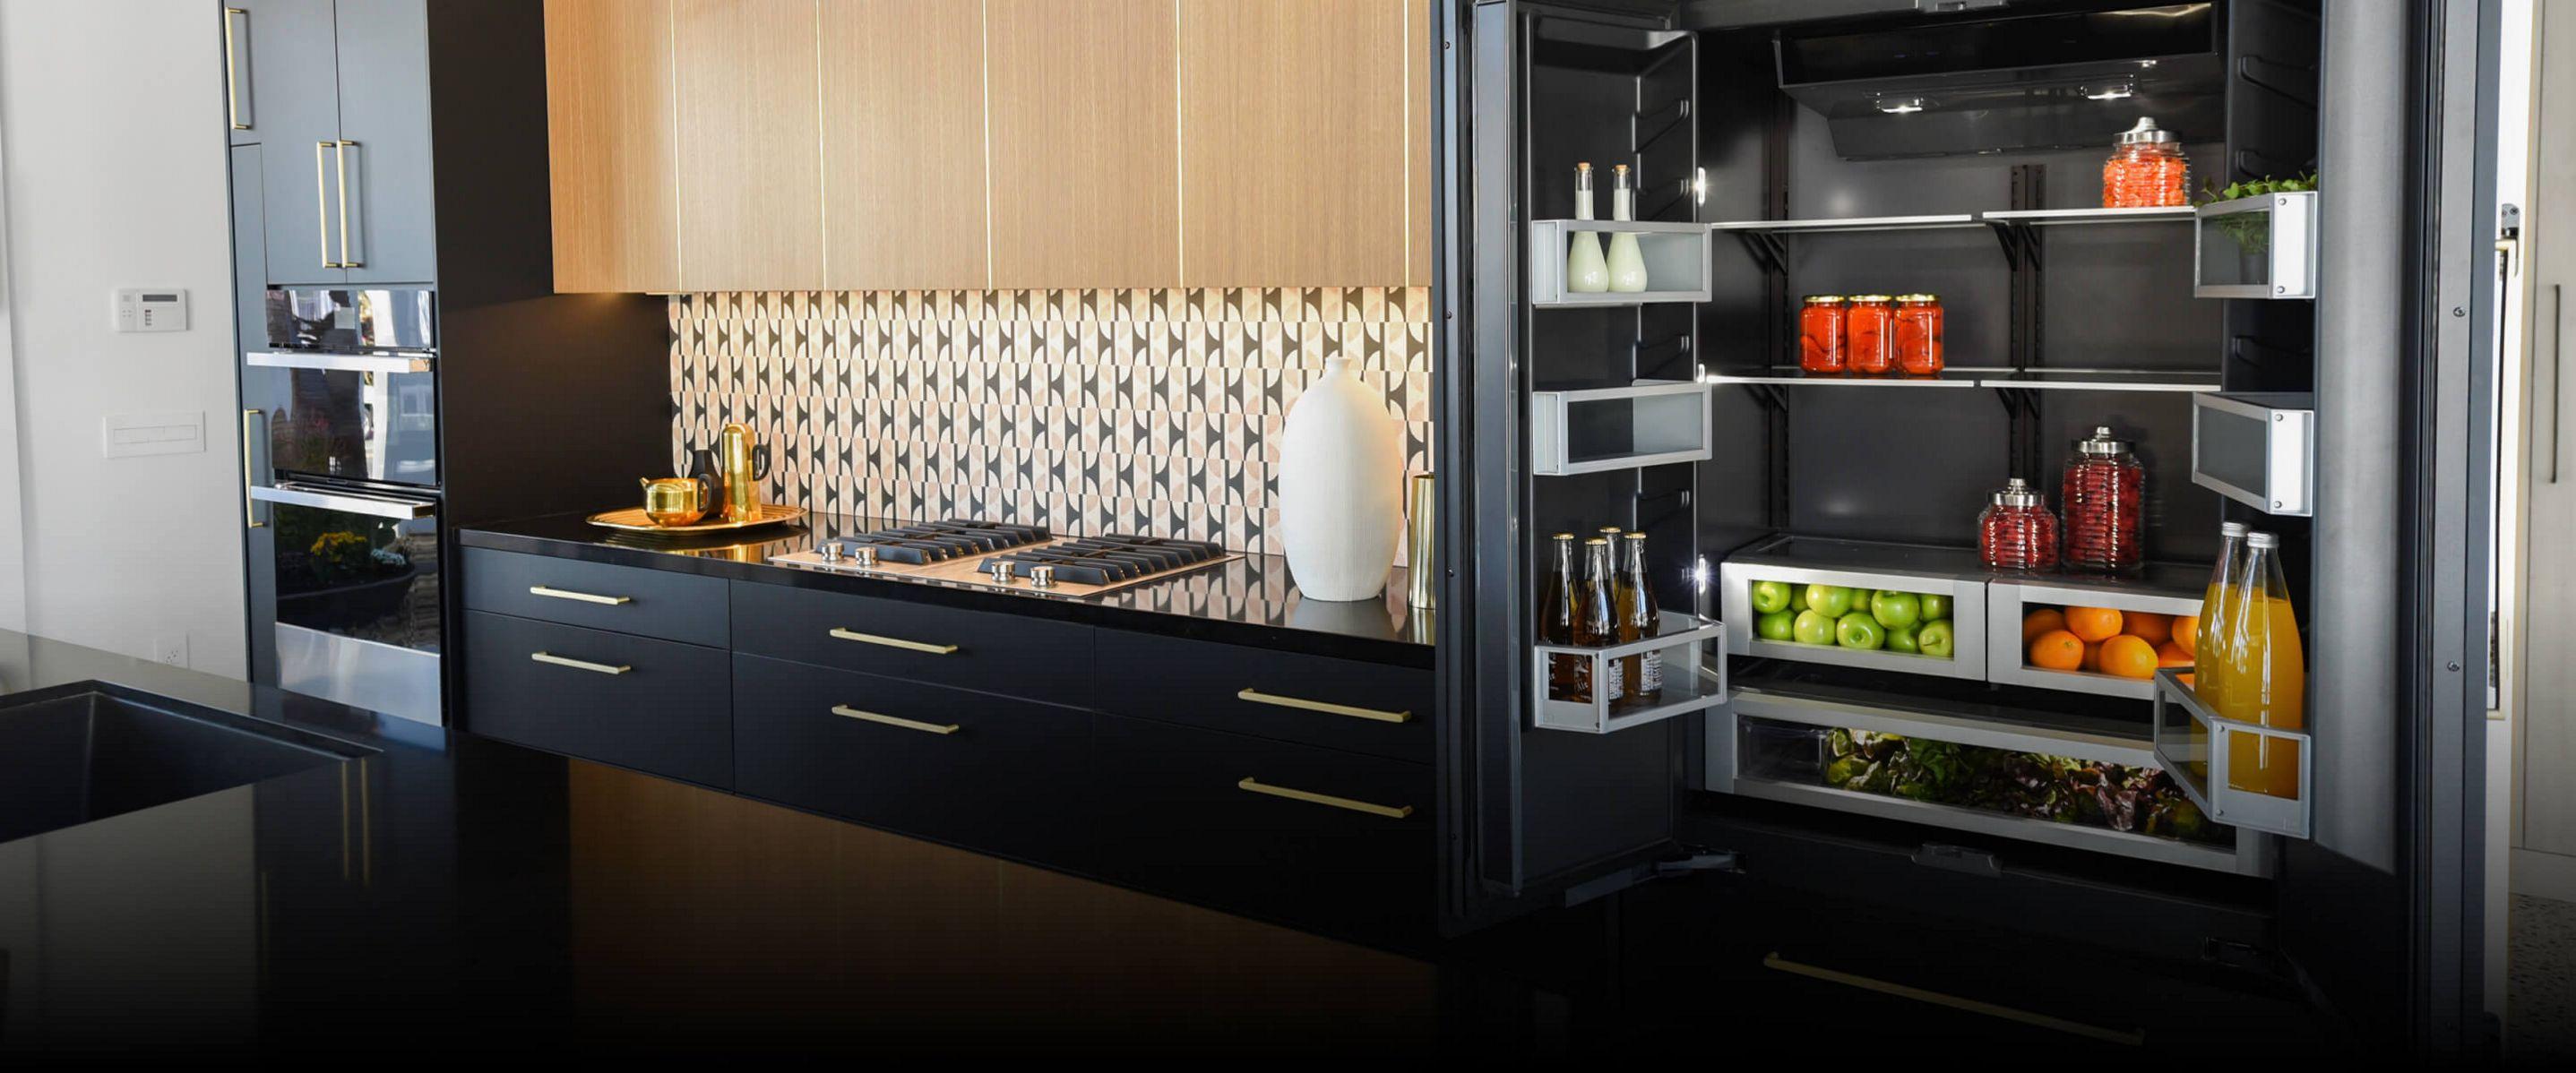 JennAir® appliances in a high-end kitchen.